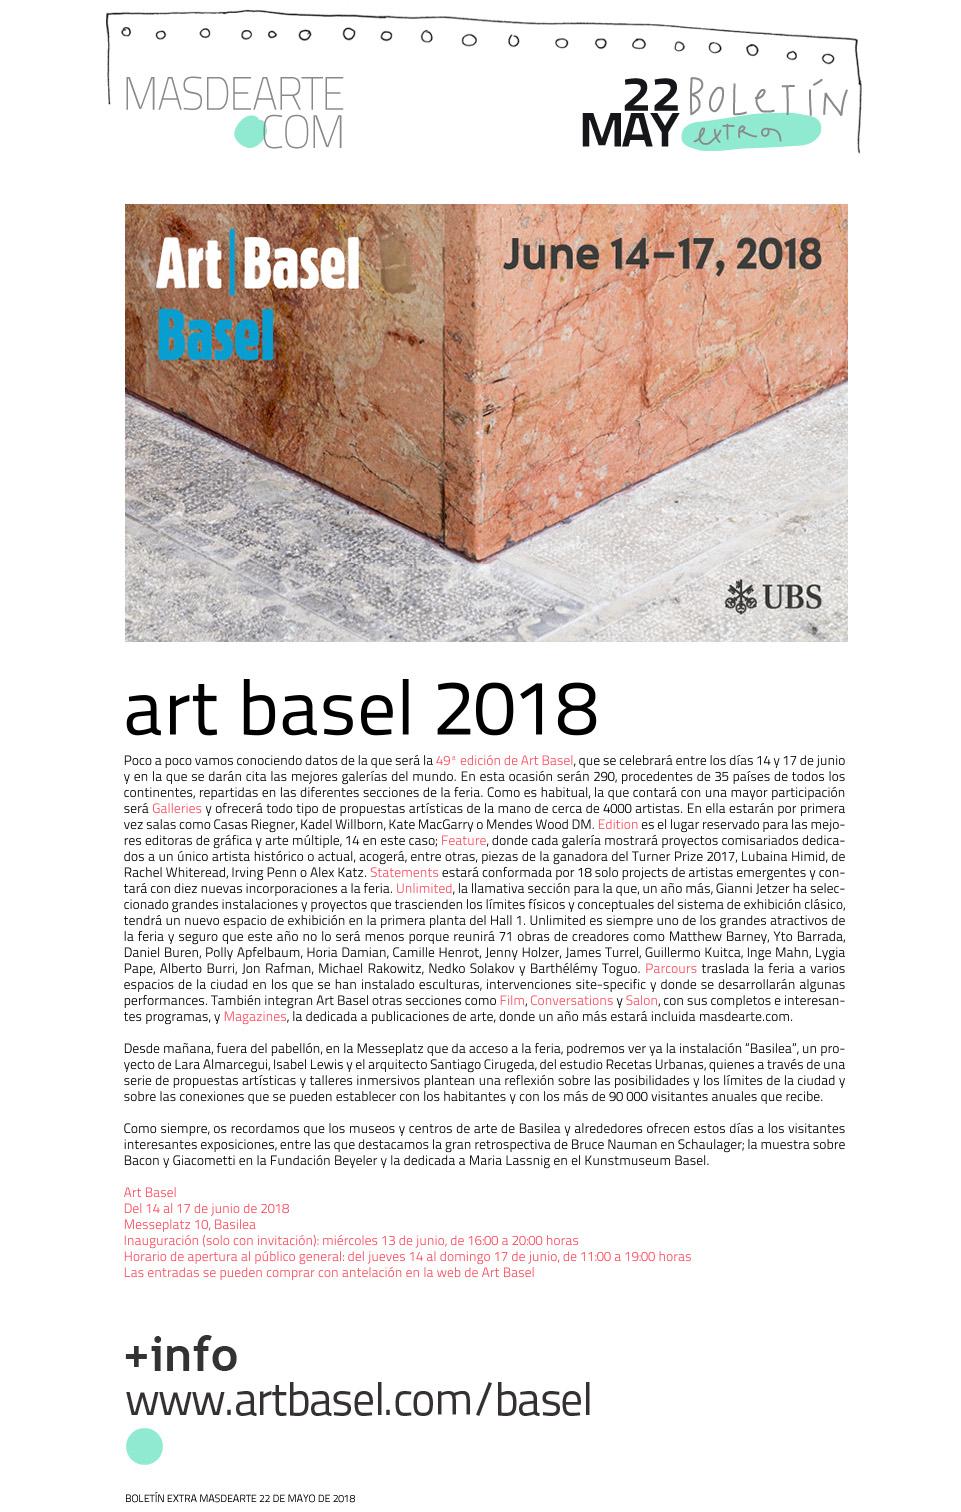 Art Basel. Del 14 al 17 de junio 2018